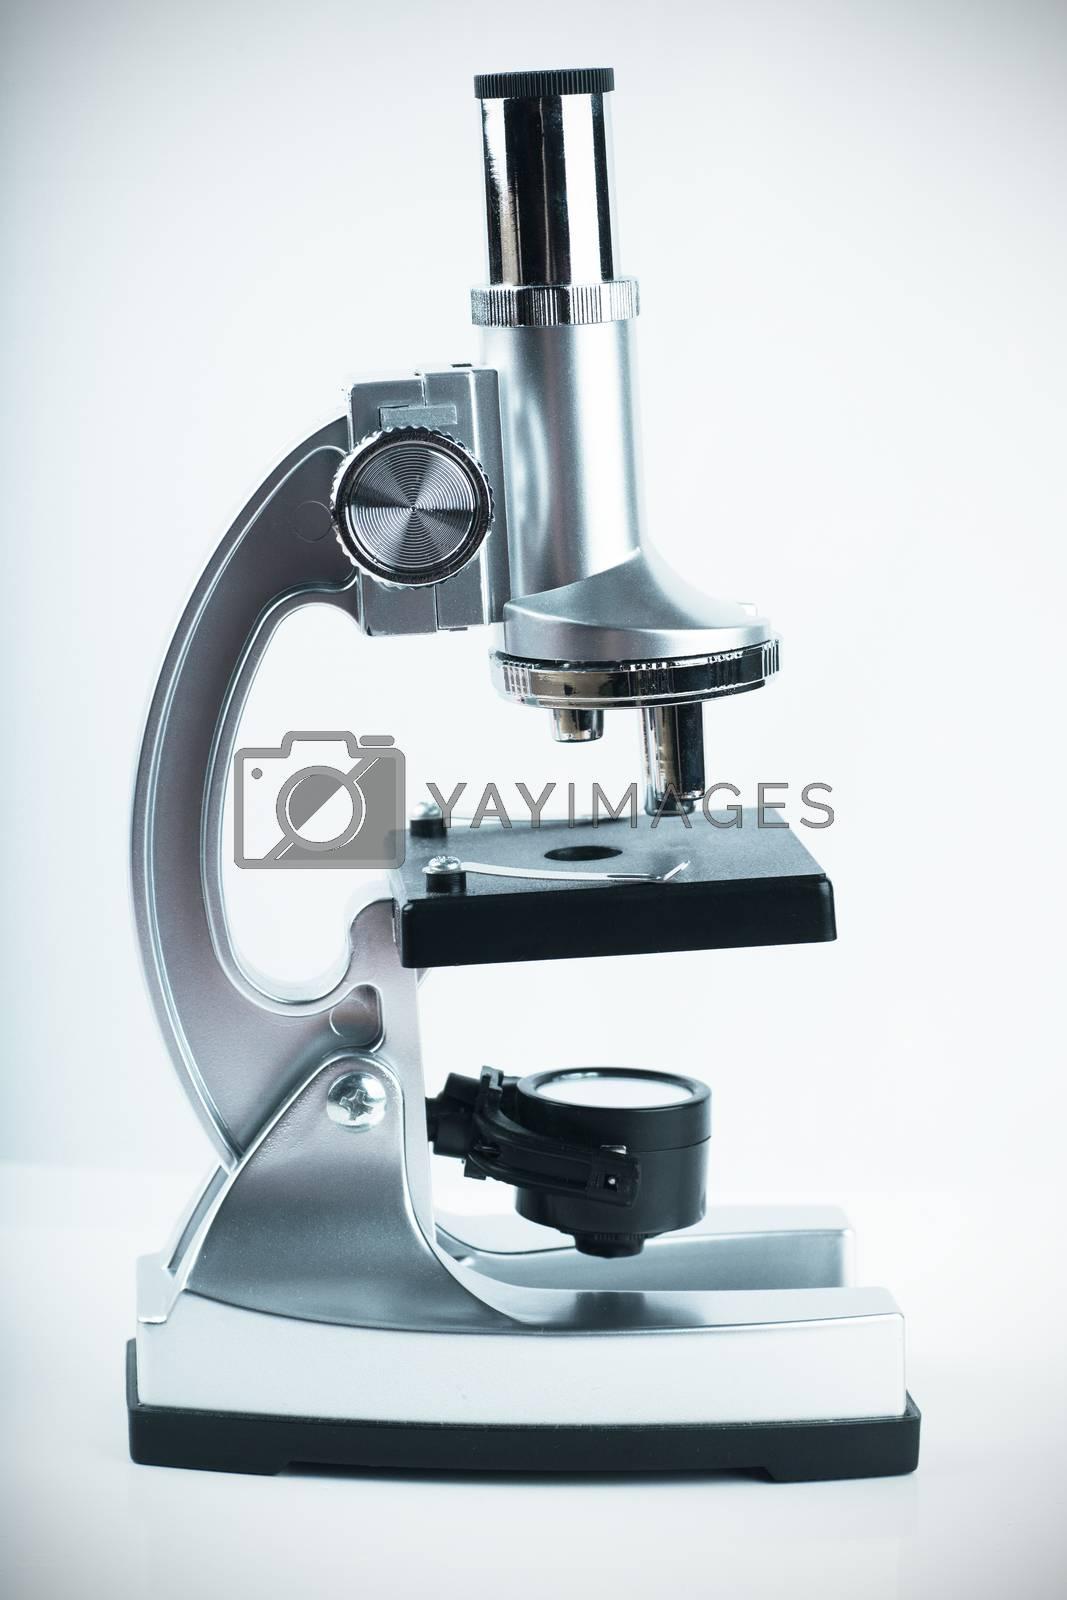 Closeup view of single microscope